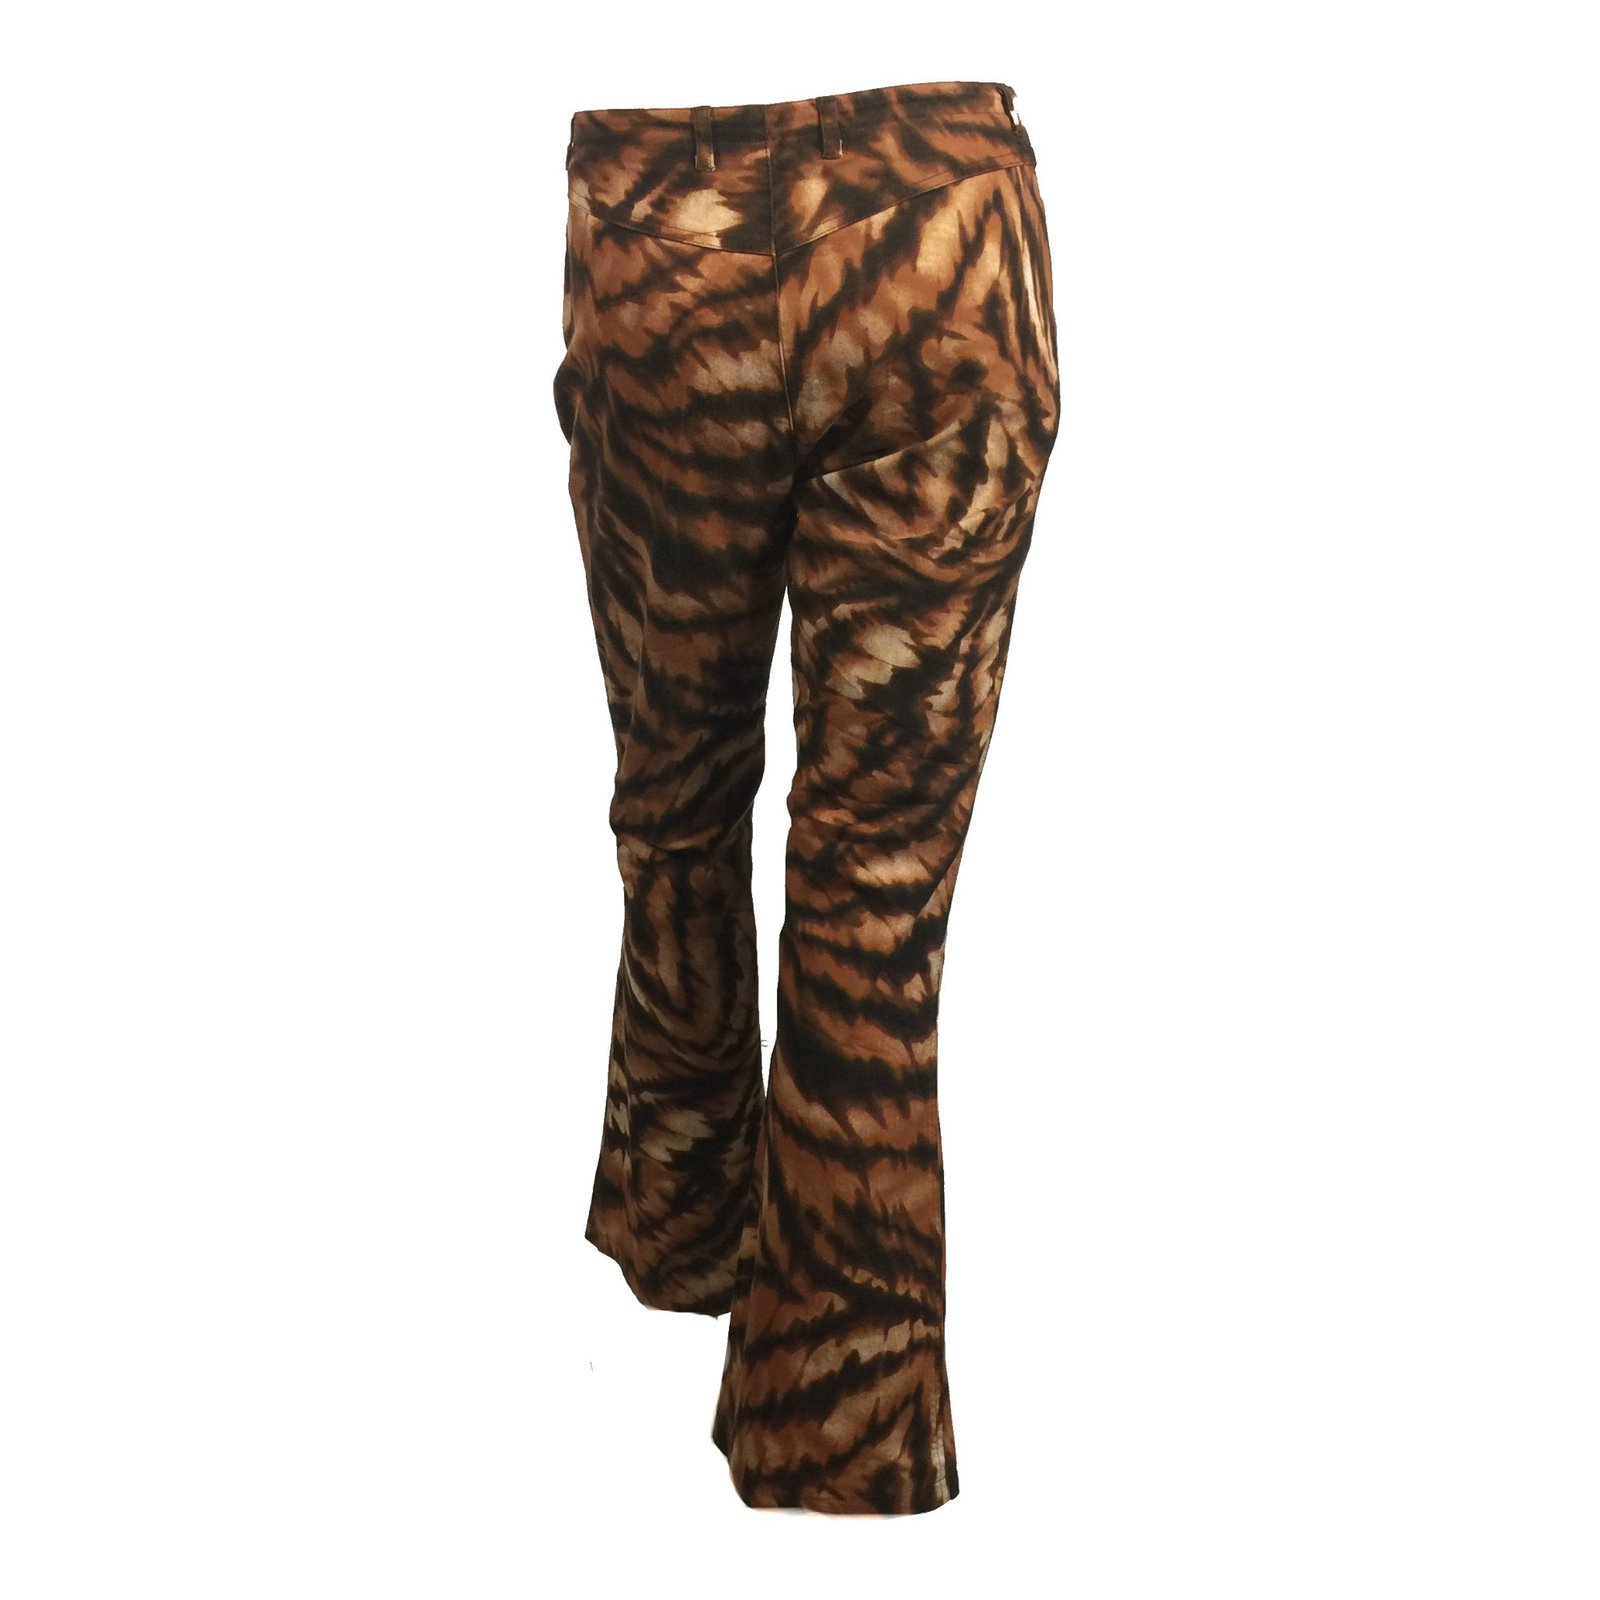 6f45bc8d3edb Escada Animal print trousers Pants, leggings Cotton,Elastane Brown  ref.77909 - Joli Closet